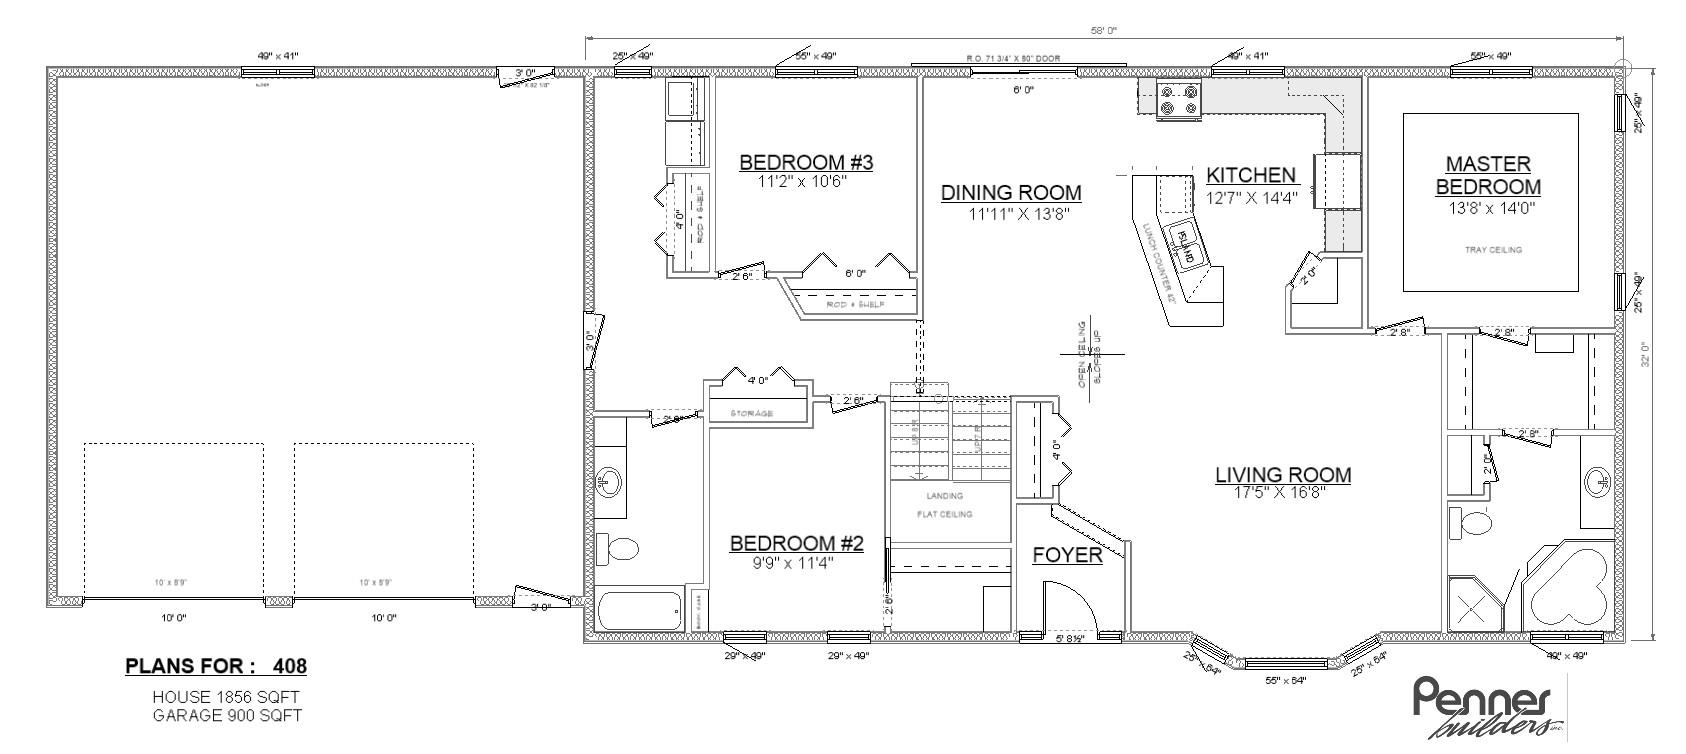 rtm house plans